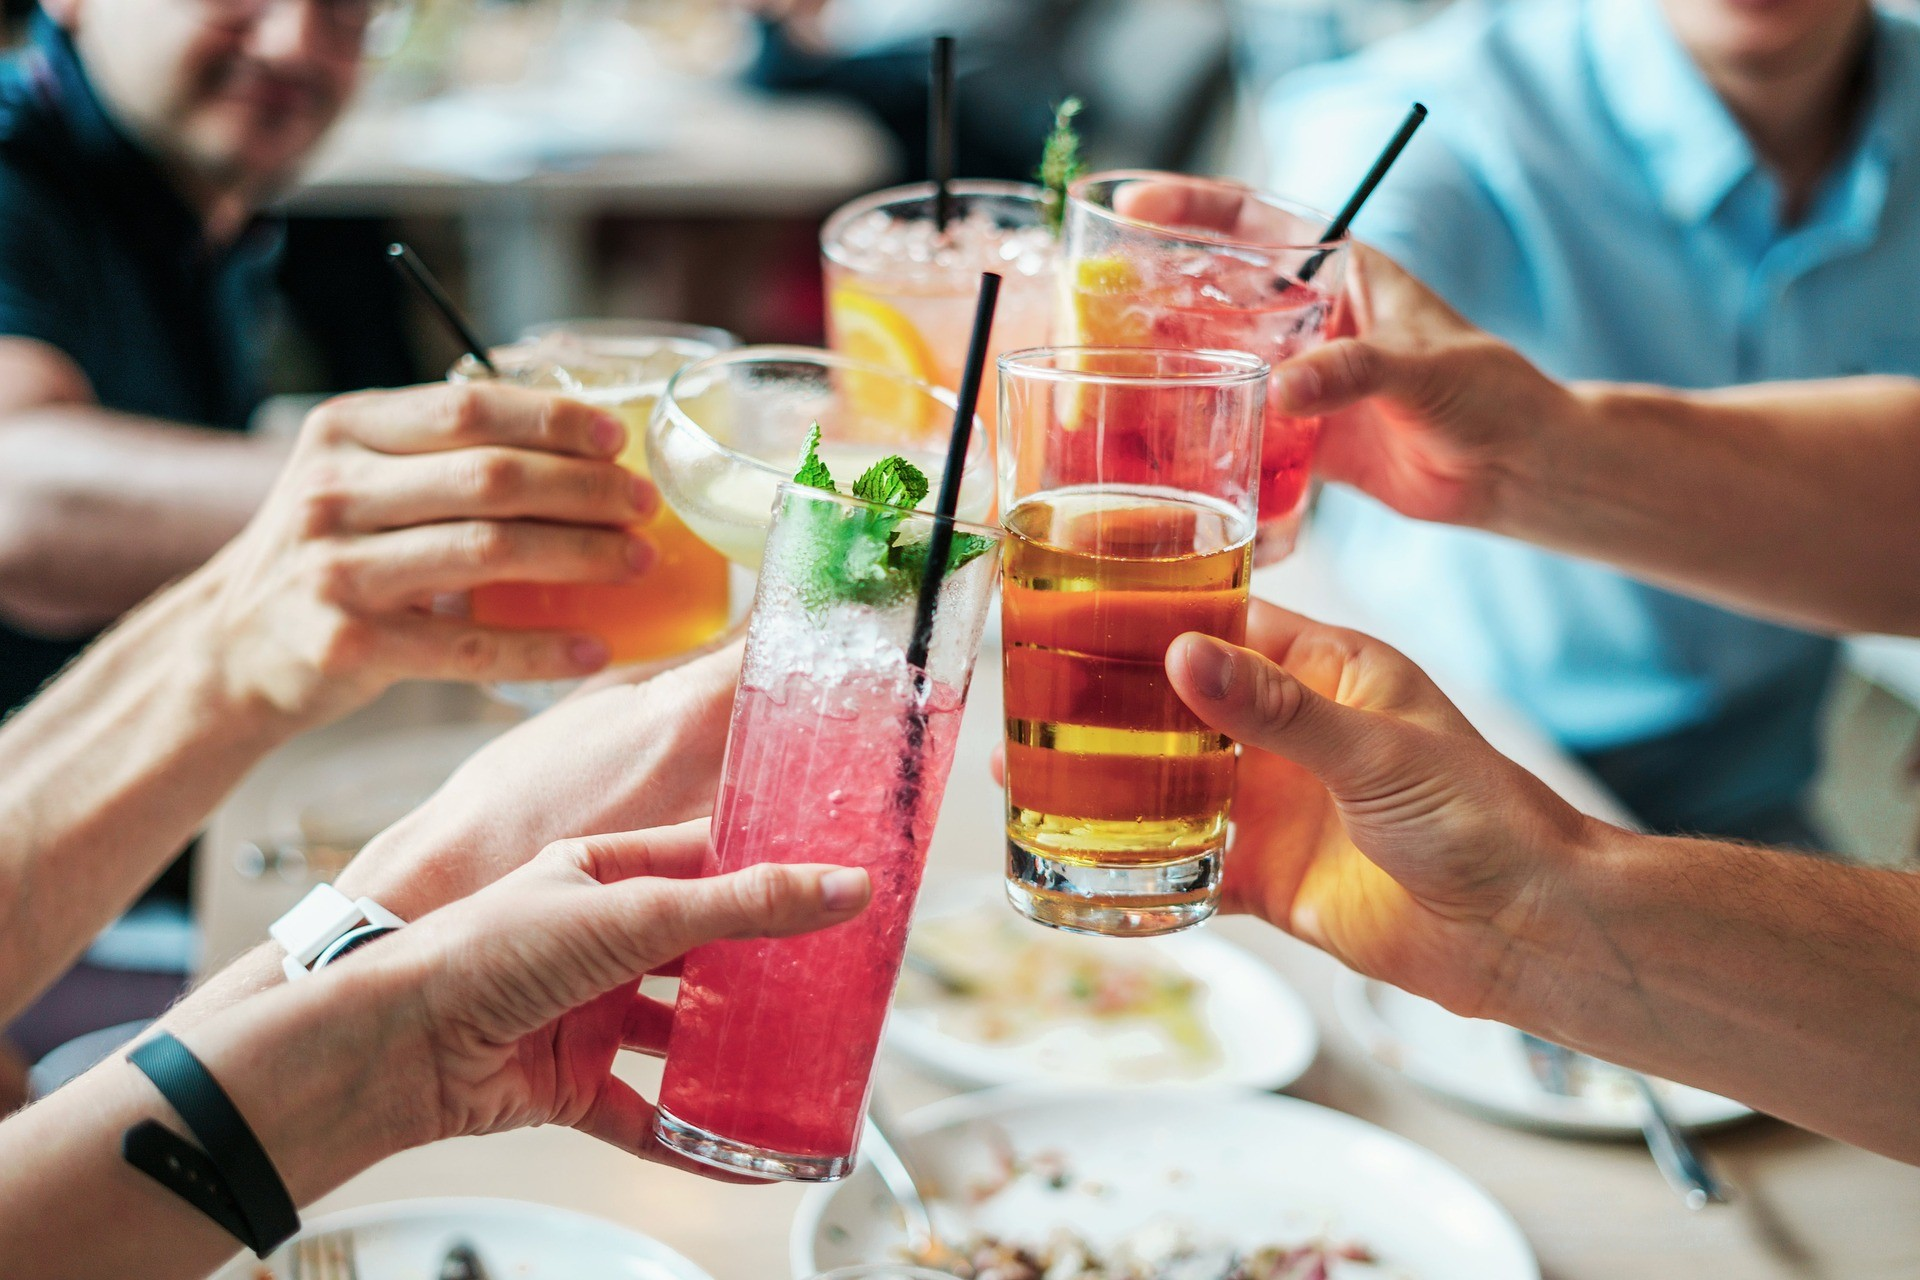 Po co nam alkohol?